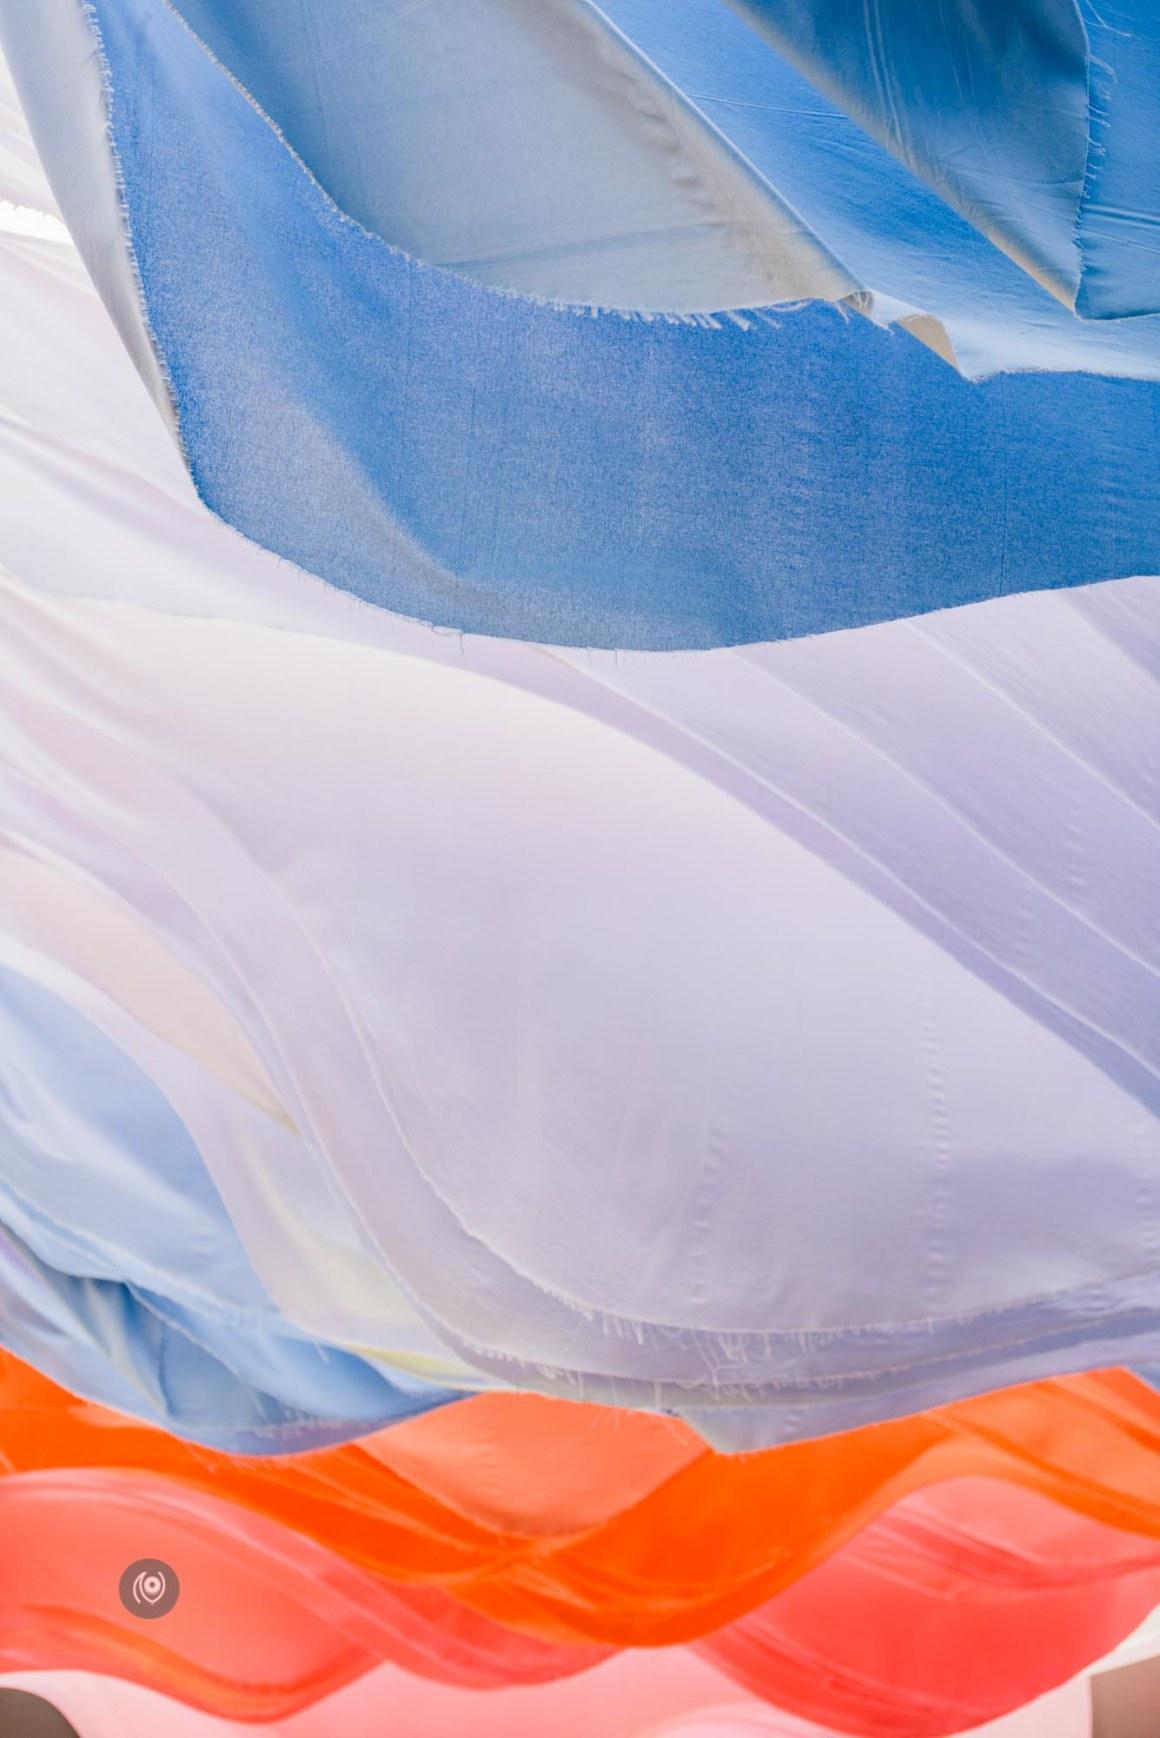 #CoverUp 66, #AIFWAW16, Amazon India Fashion Week Autumn Winter 2016, Anuradha Prasad Dhawan, Anu PD, Purab Paschim, Ankit Khullar, Naina.co, Naina Redhu, Luxury Photographer, Lifestyle Photographer, Luxury Blogger, Lifestyle Blogger, Experience Collector, Personal Style, #MadeInIndia, #CoverUp